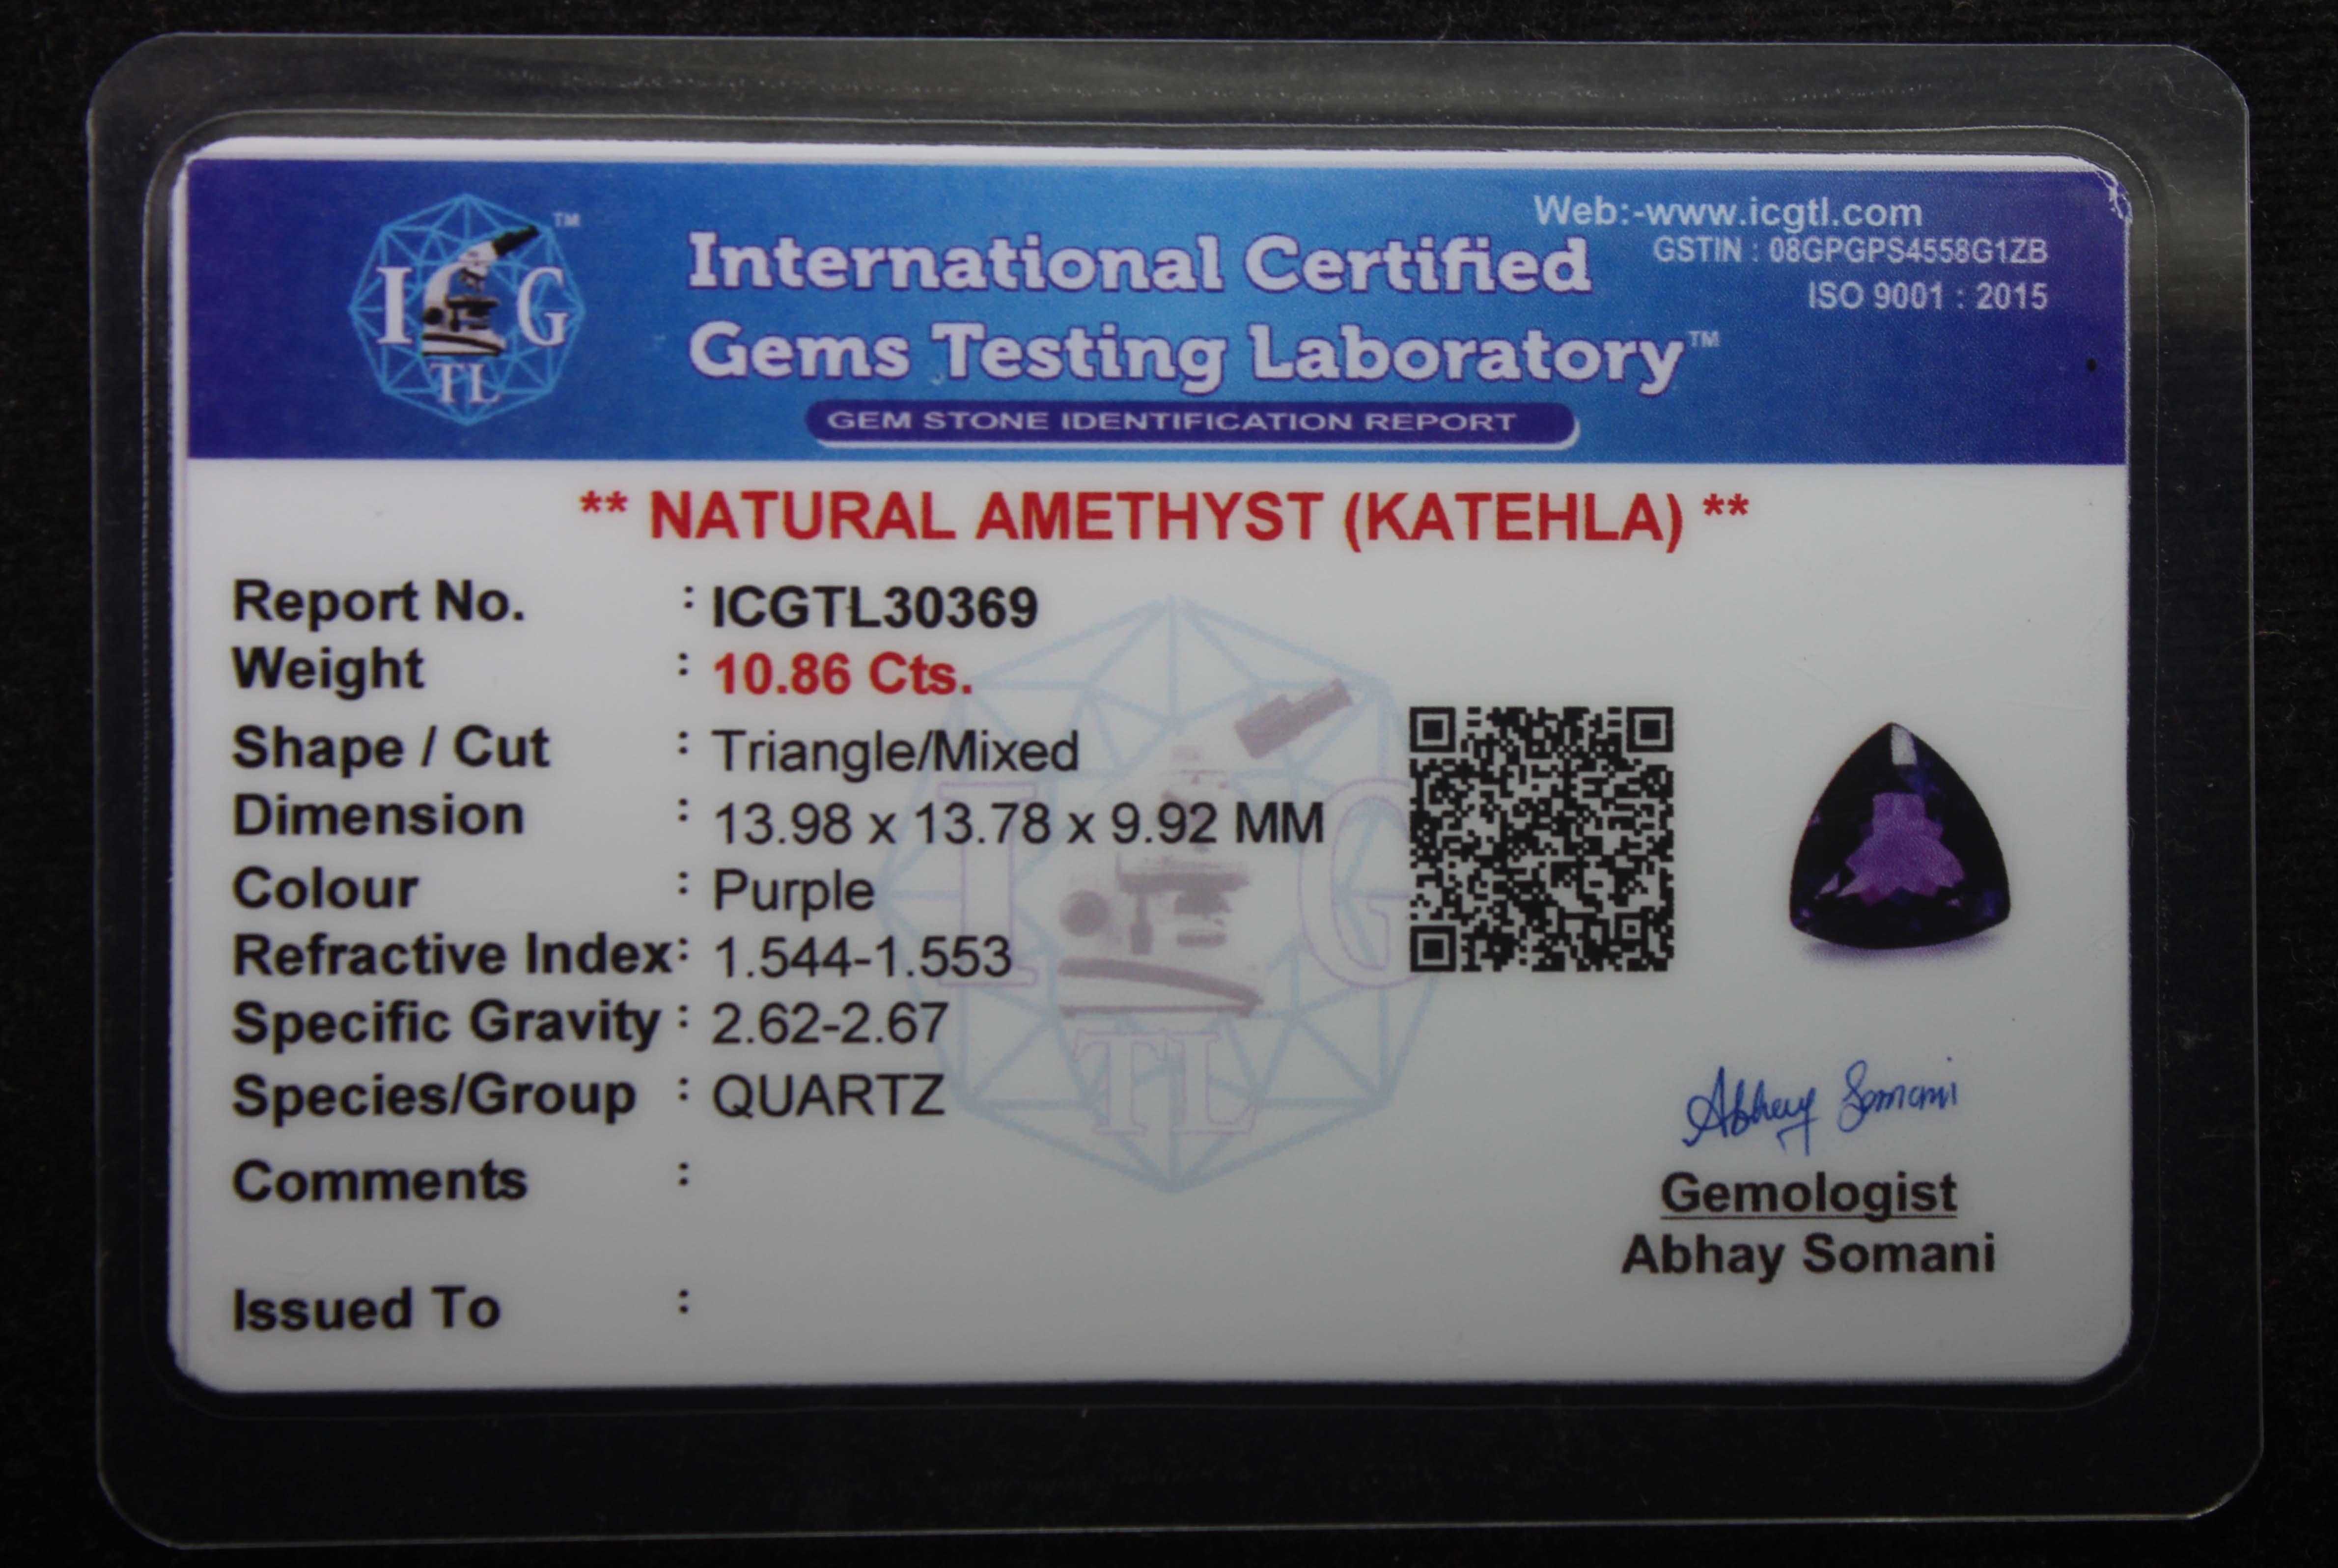 Amethyst 10.86Ct - Image 5 of 5